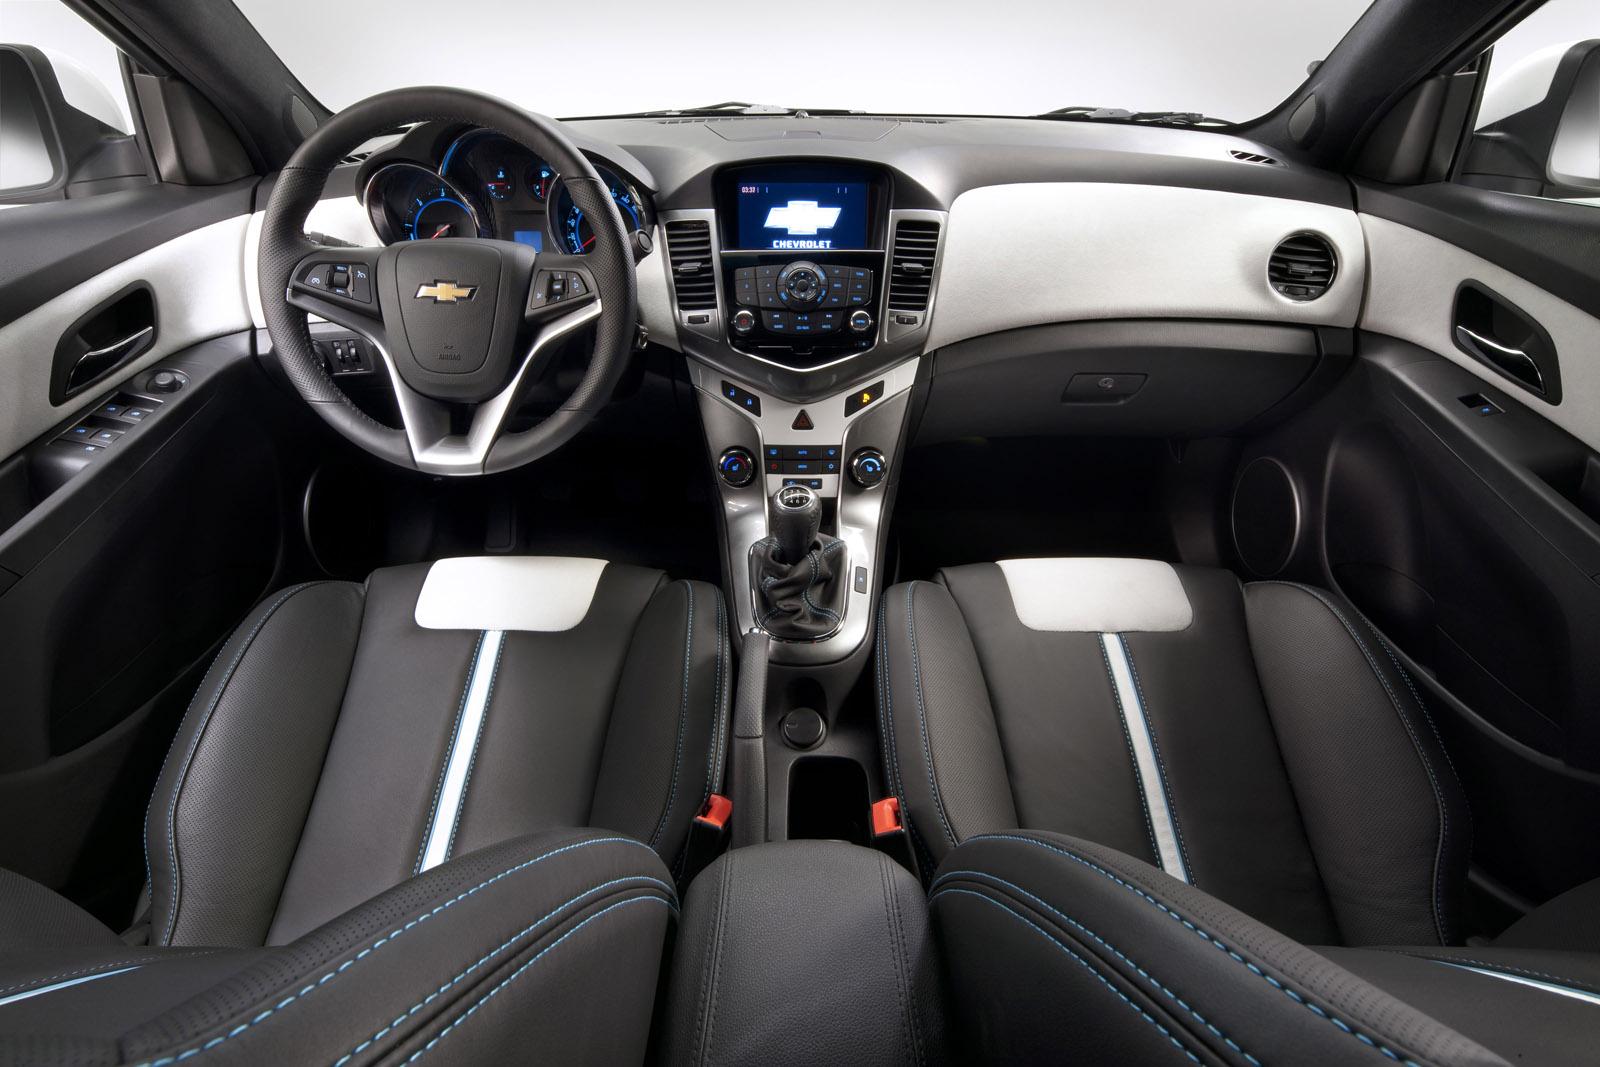 Cruze 2012 chevy cruze interior : 2012 Chevrolet Cruze Hatchback review ~ Car Report Daily